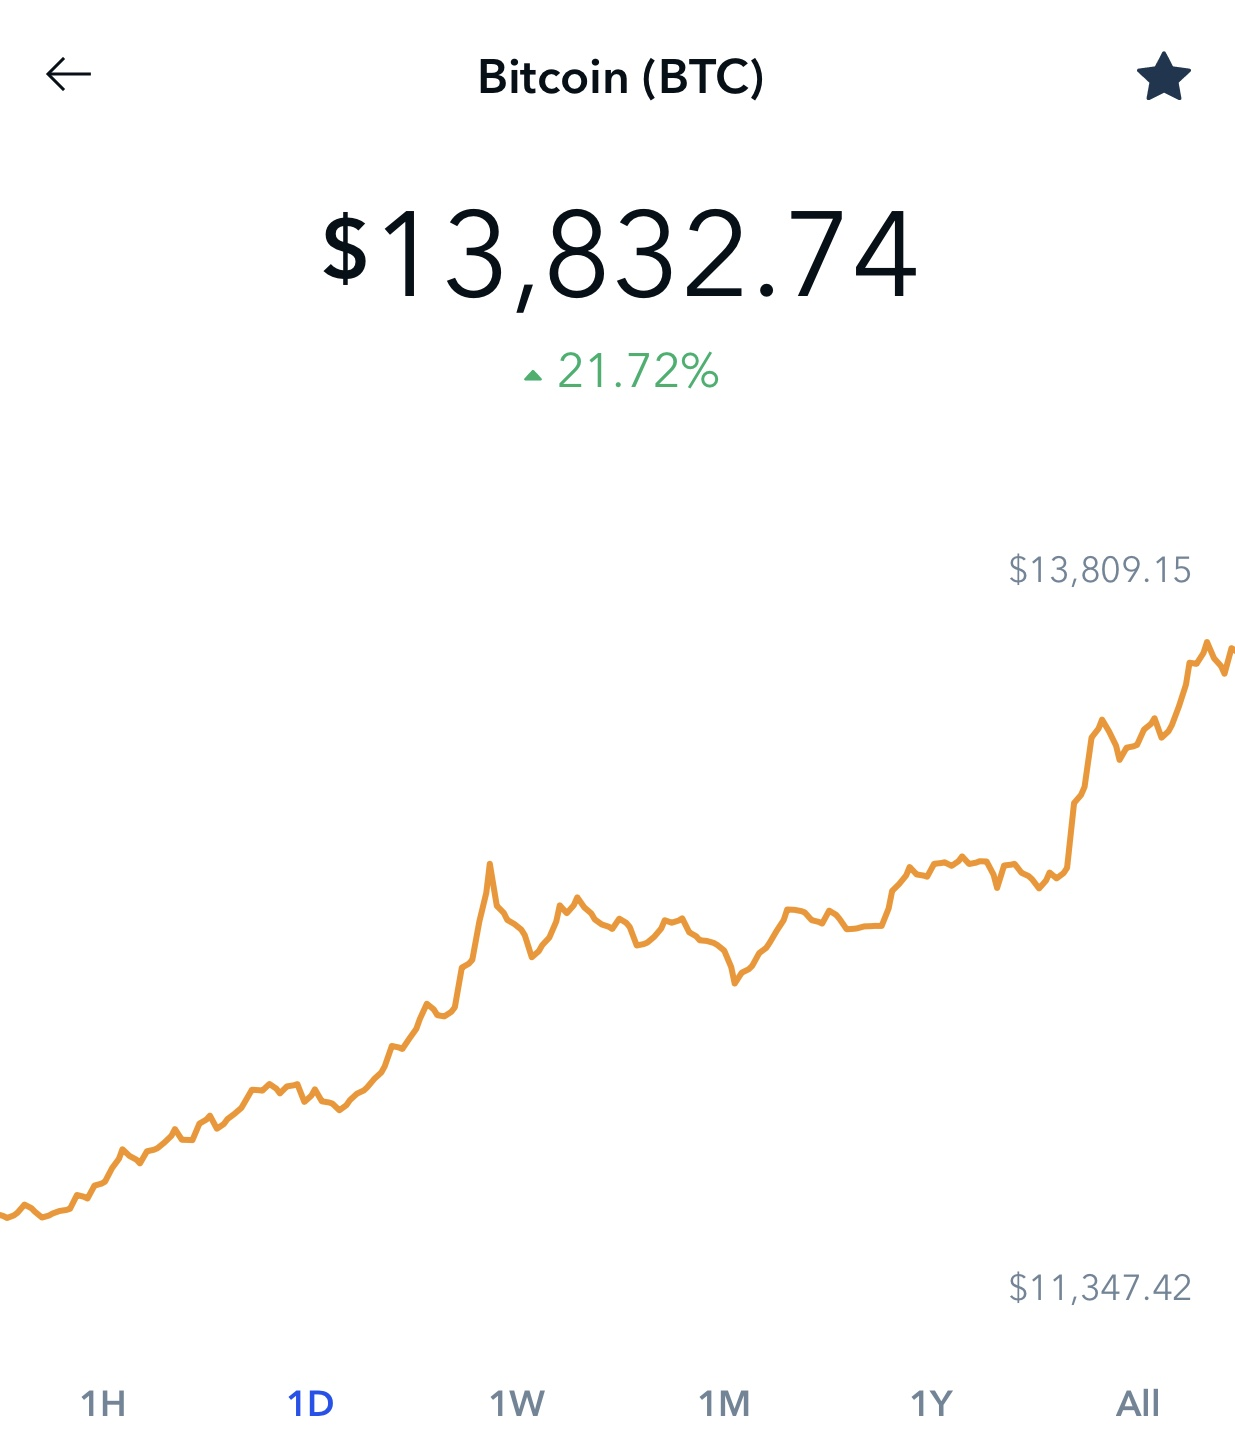 Bitcoin price on June 26th via Coinbase app.